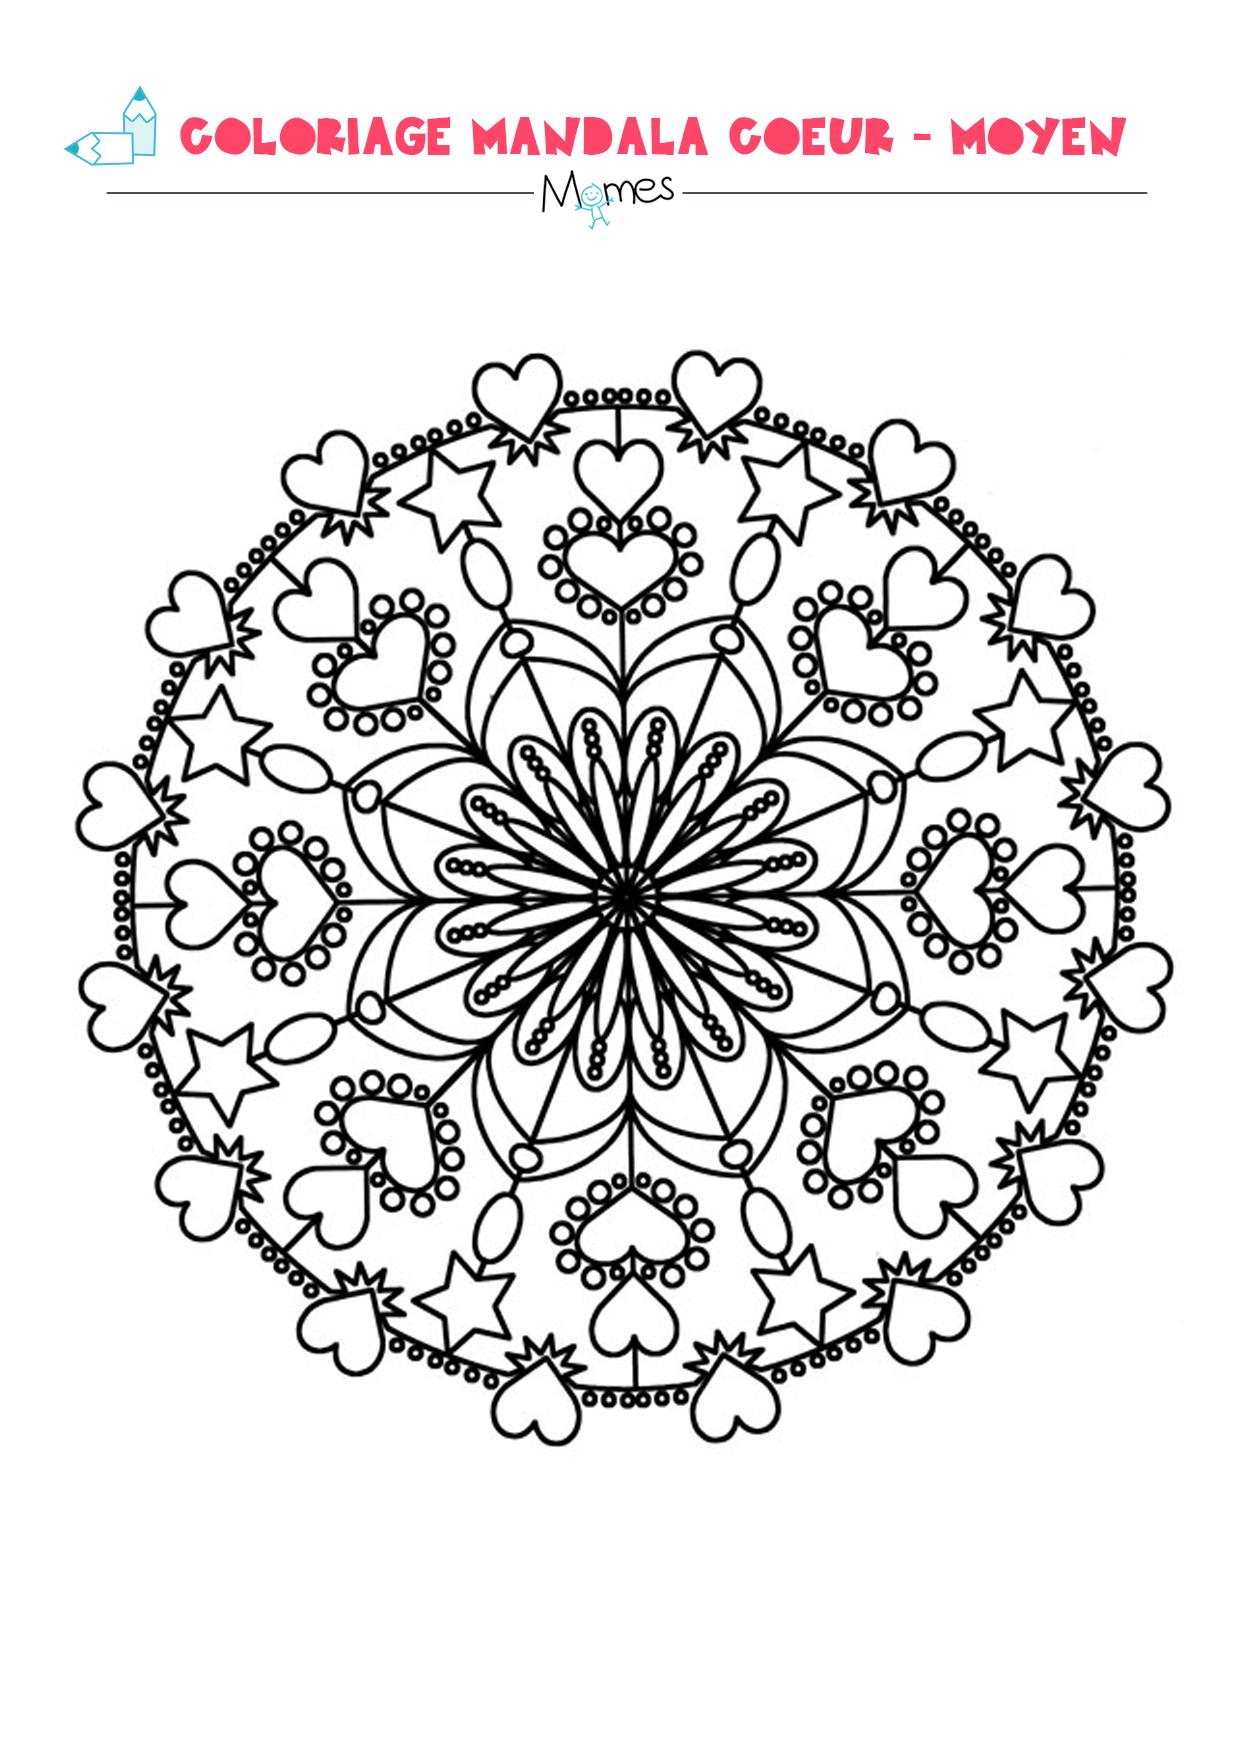 Mandala Coeur à colorier   Moyen   MOMES.net